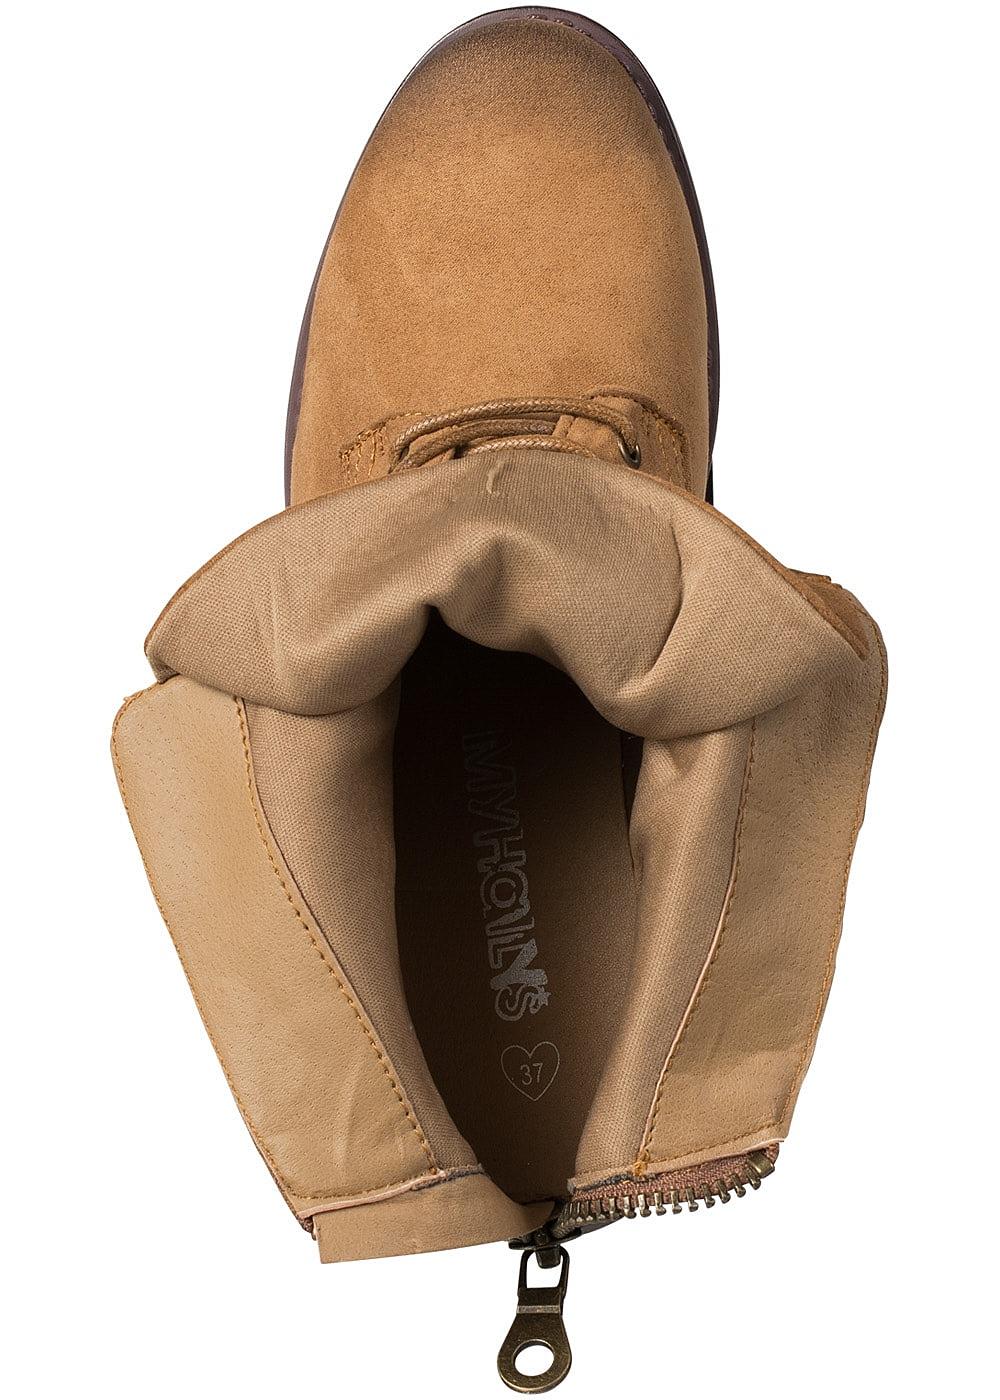 hailys damen schn r boots wildleder optik zipper hinten camel braun 77onlineshop. Black Bedroom Furniture Sets. Home Design Ideas